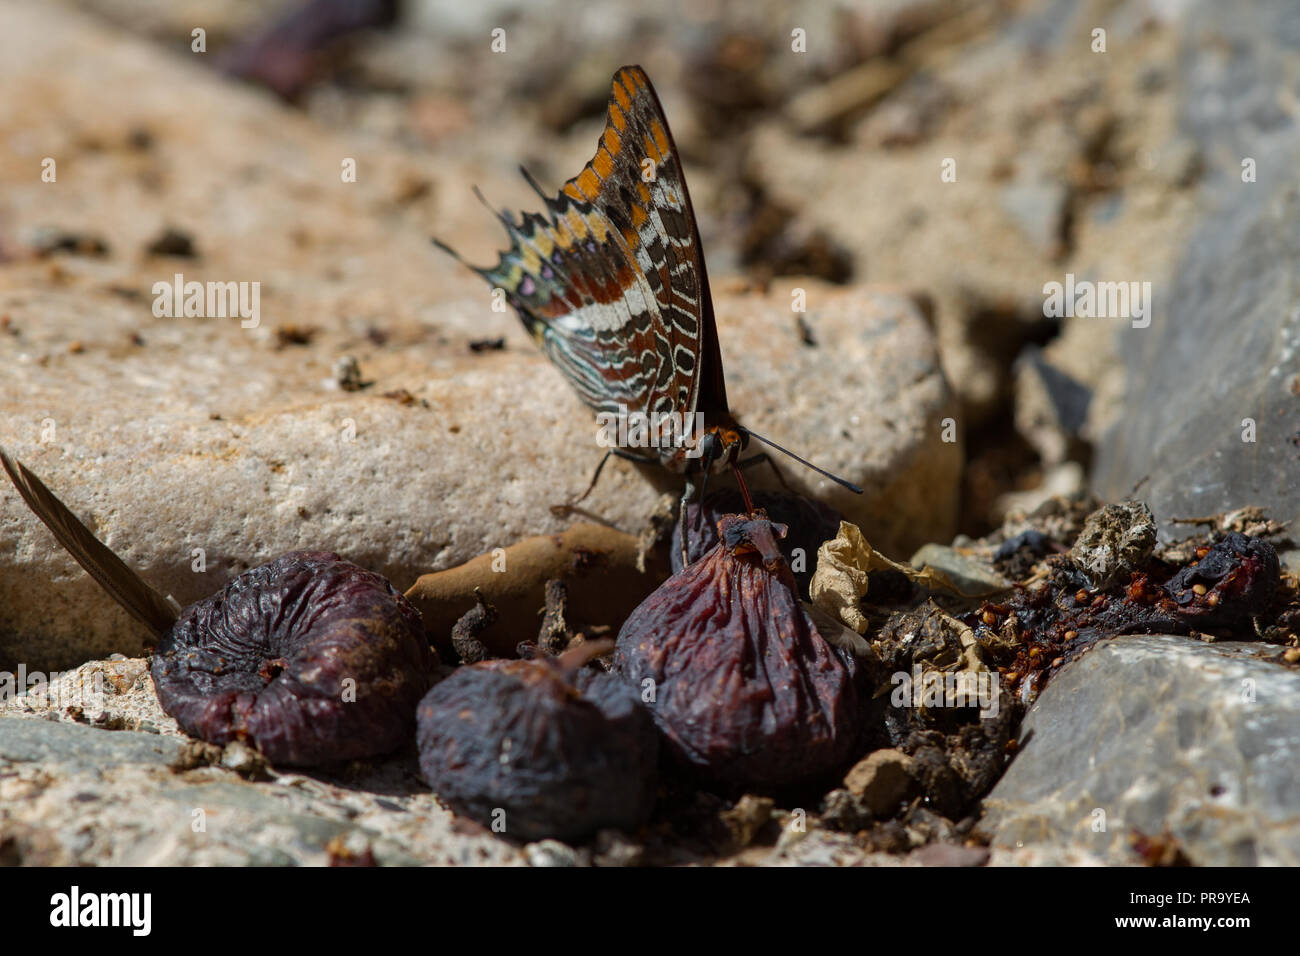 Two Tailed Pasha butterfly Charaxes jasius  feeding on fallen fig. Sardinia. Italy - Stock Image